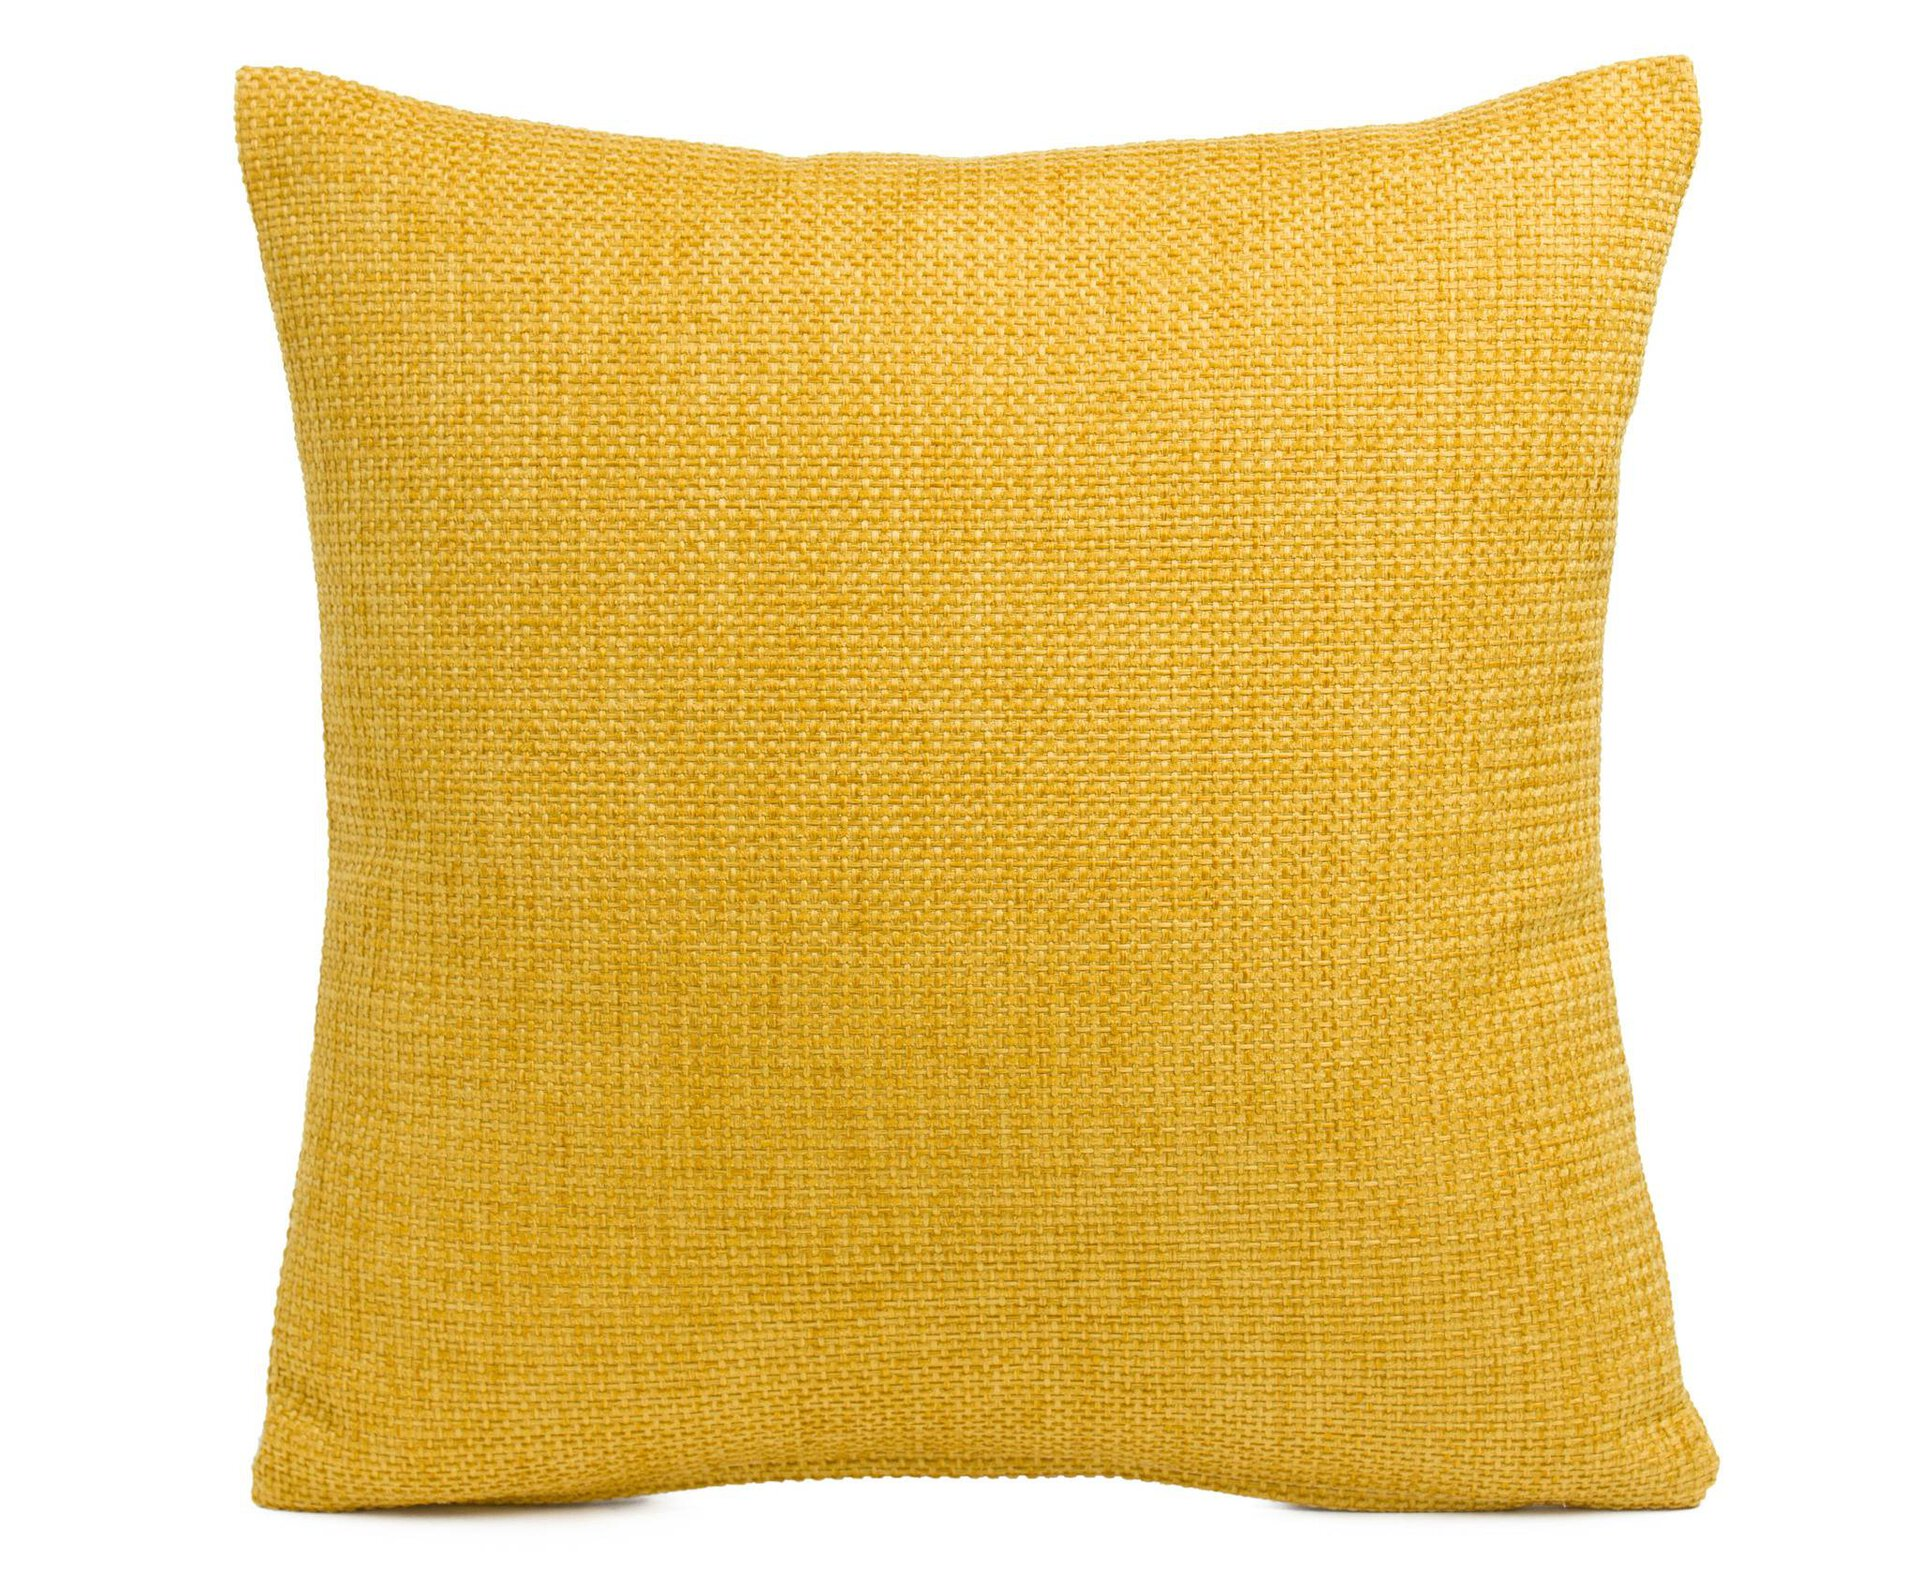 Kissenhülle Dallas Ambiente Trendlife Textil gelb 40 x 40 cm